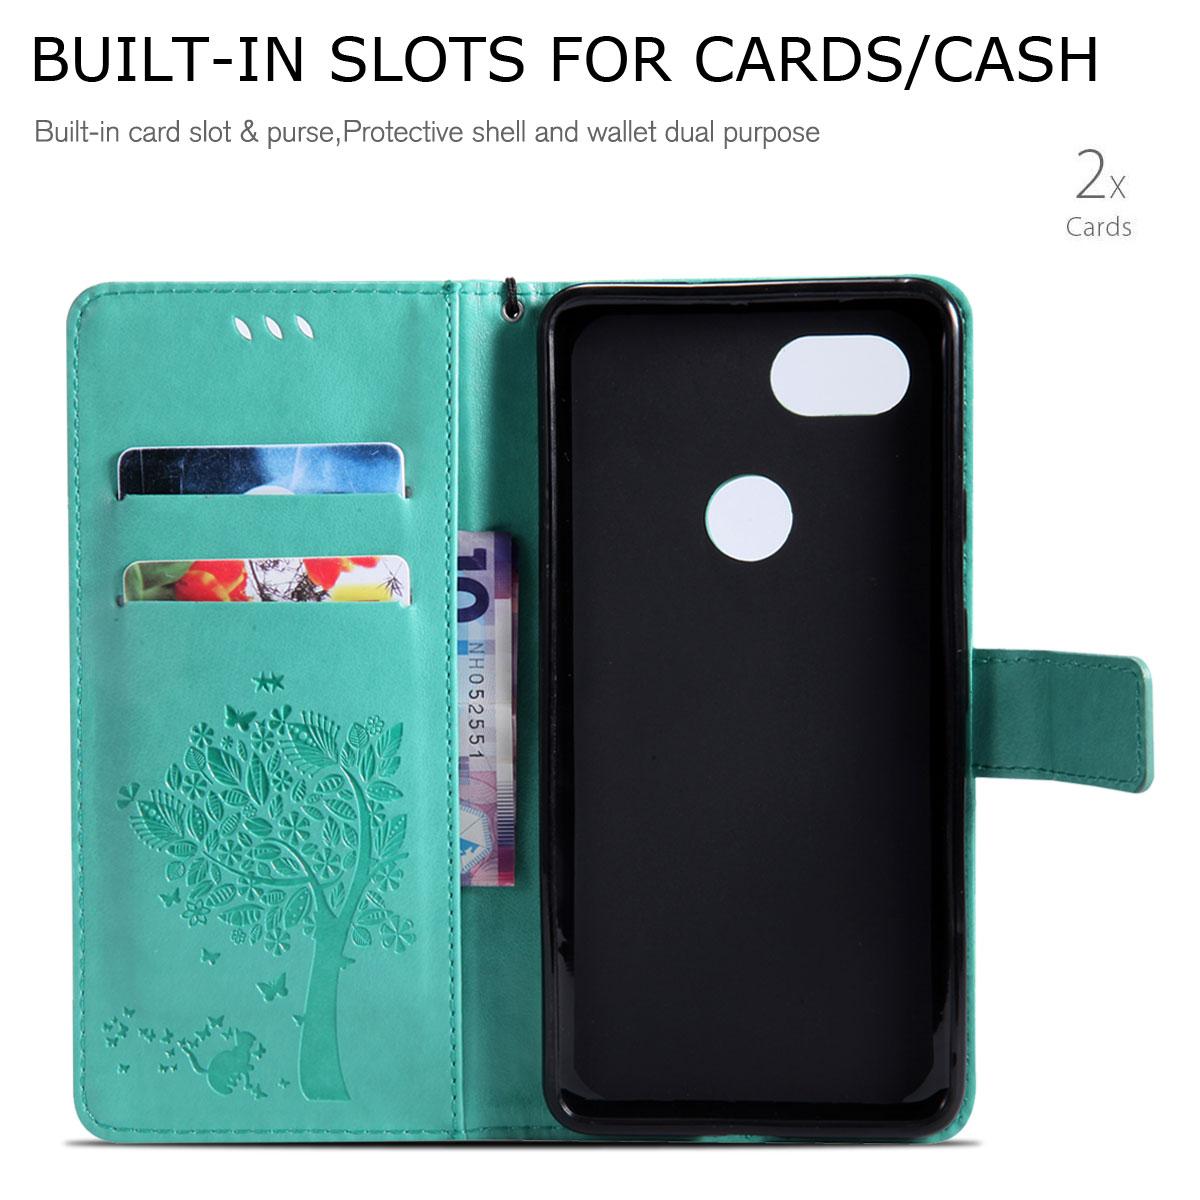 Magnetic-Leather-Credit-Card-Holder-Flip-Case-Cover-For-Google-Pixel-2-2-XL thumbnail 83